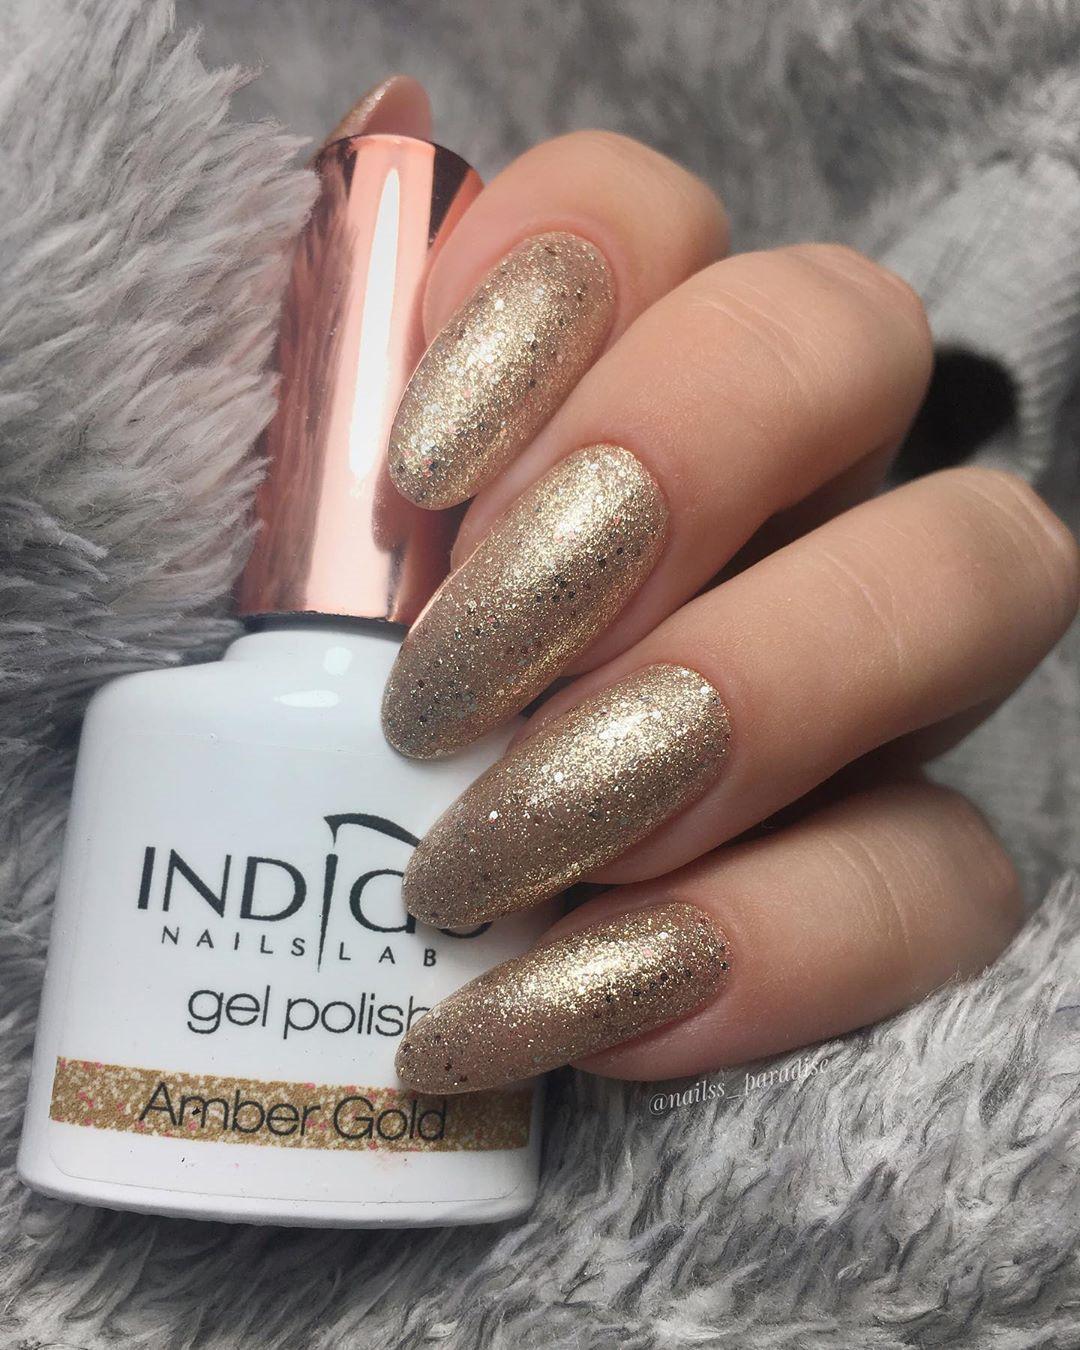 new year's eve nails, new year's nails, new year's eve acrylic nails, new year's nail ideas, new year's nail art, new year's nail designs